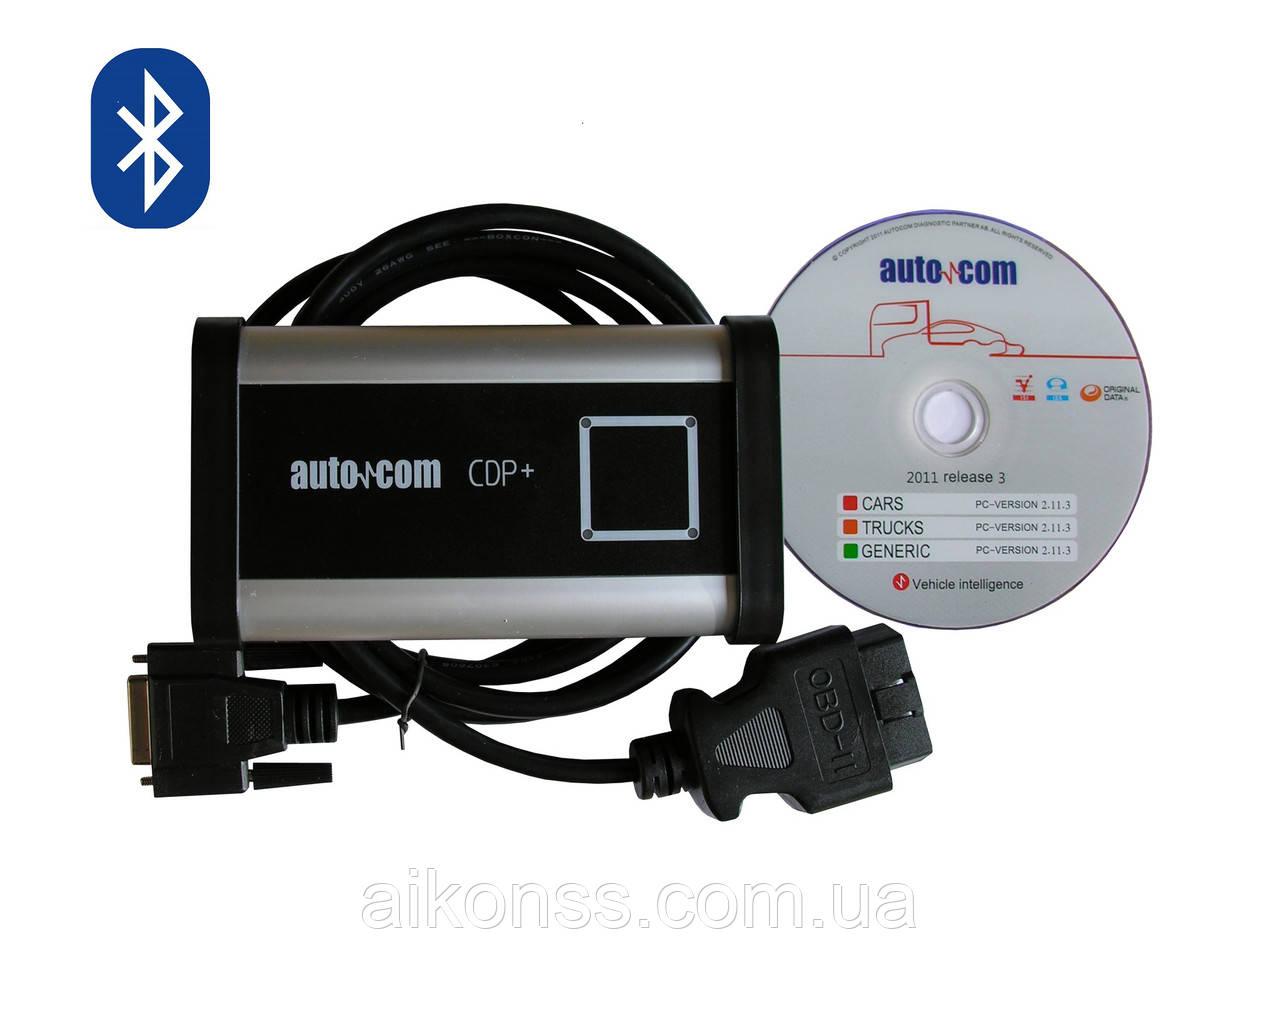 Bluetooth 2014R3 Autocom CDP+ TCS DS150 сканер мультімарочний